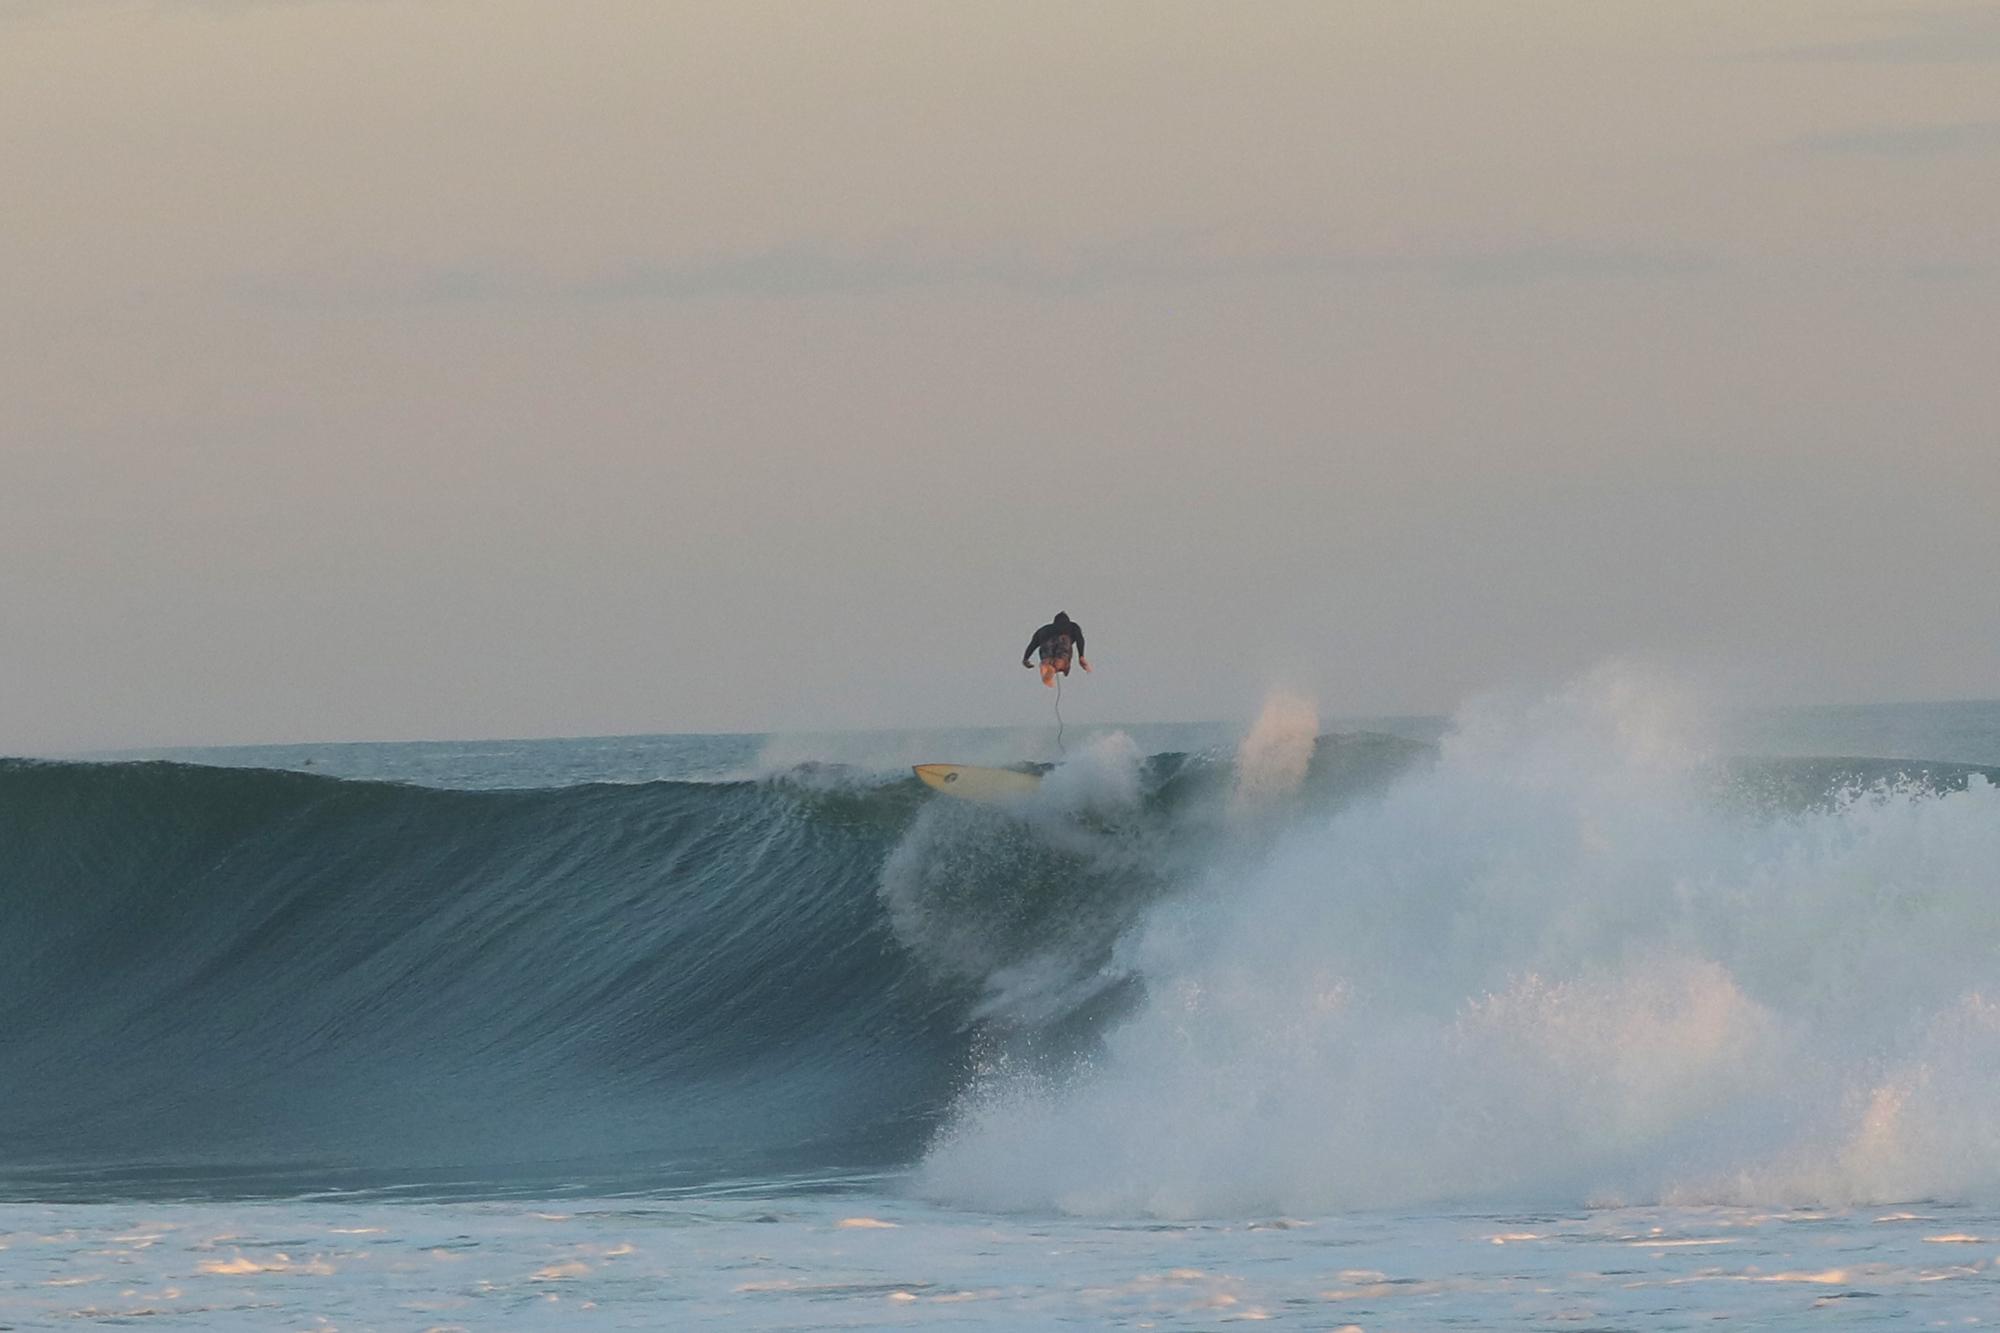 11-9-17 K59 Big Wave 4 kick out.jpg